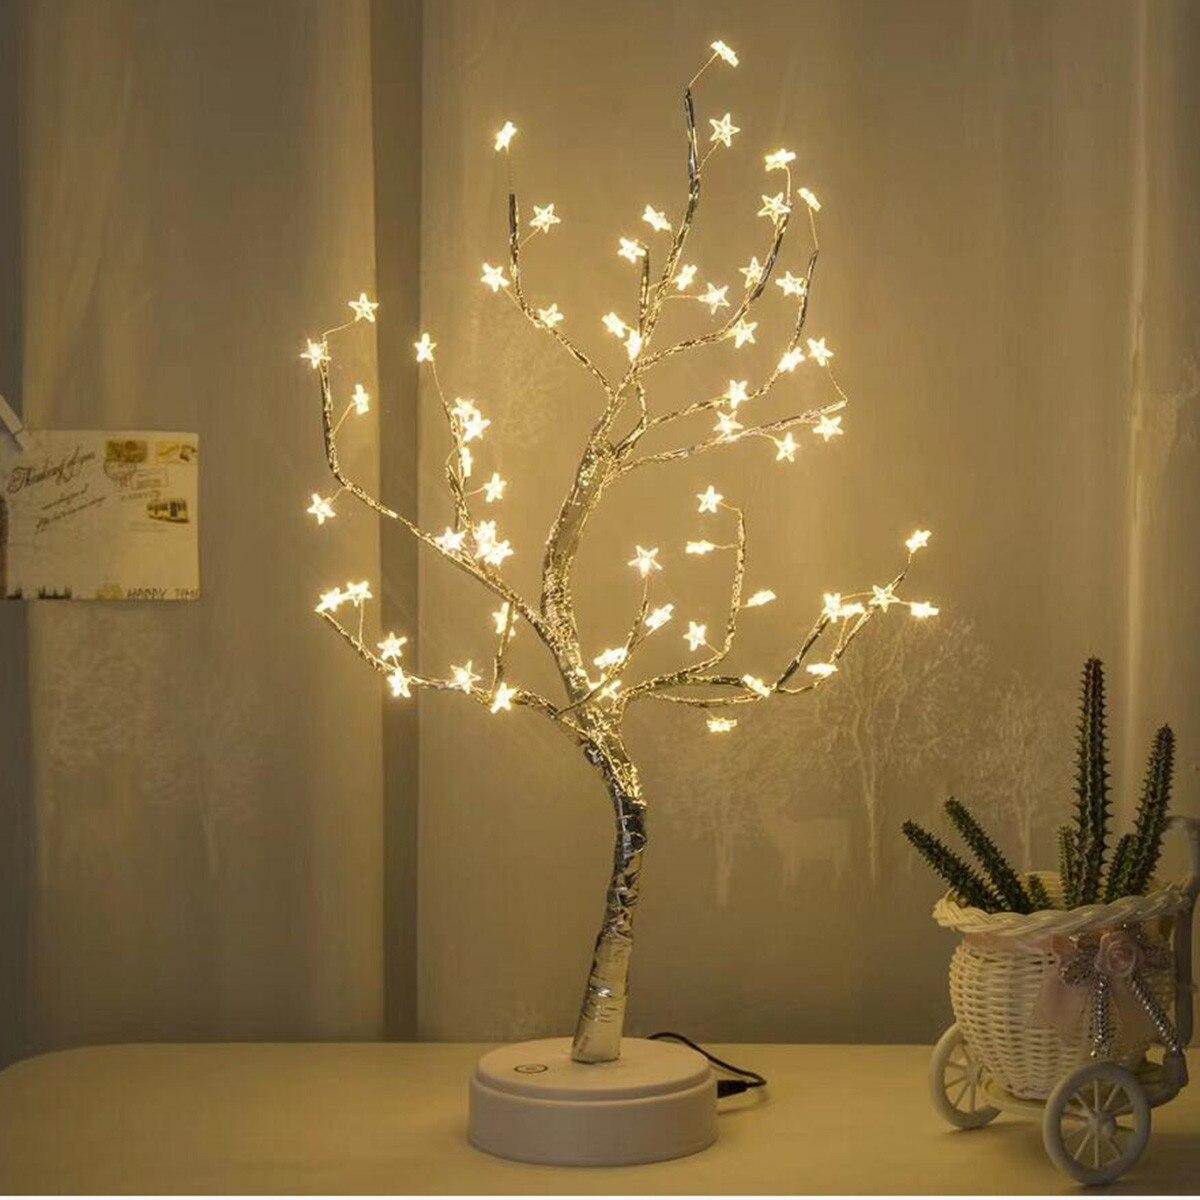 Original ALIWARM LED สีขาว 60 สีขาวโคมไฟดาวสำหรับตกแต่งบ้านห้องนอน Dropshipping 20